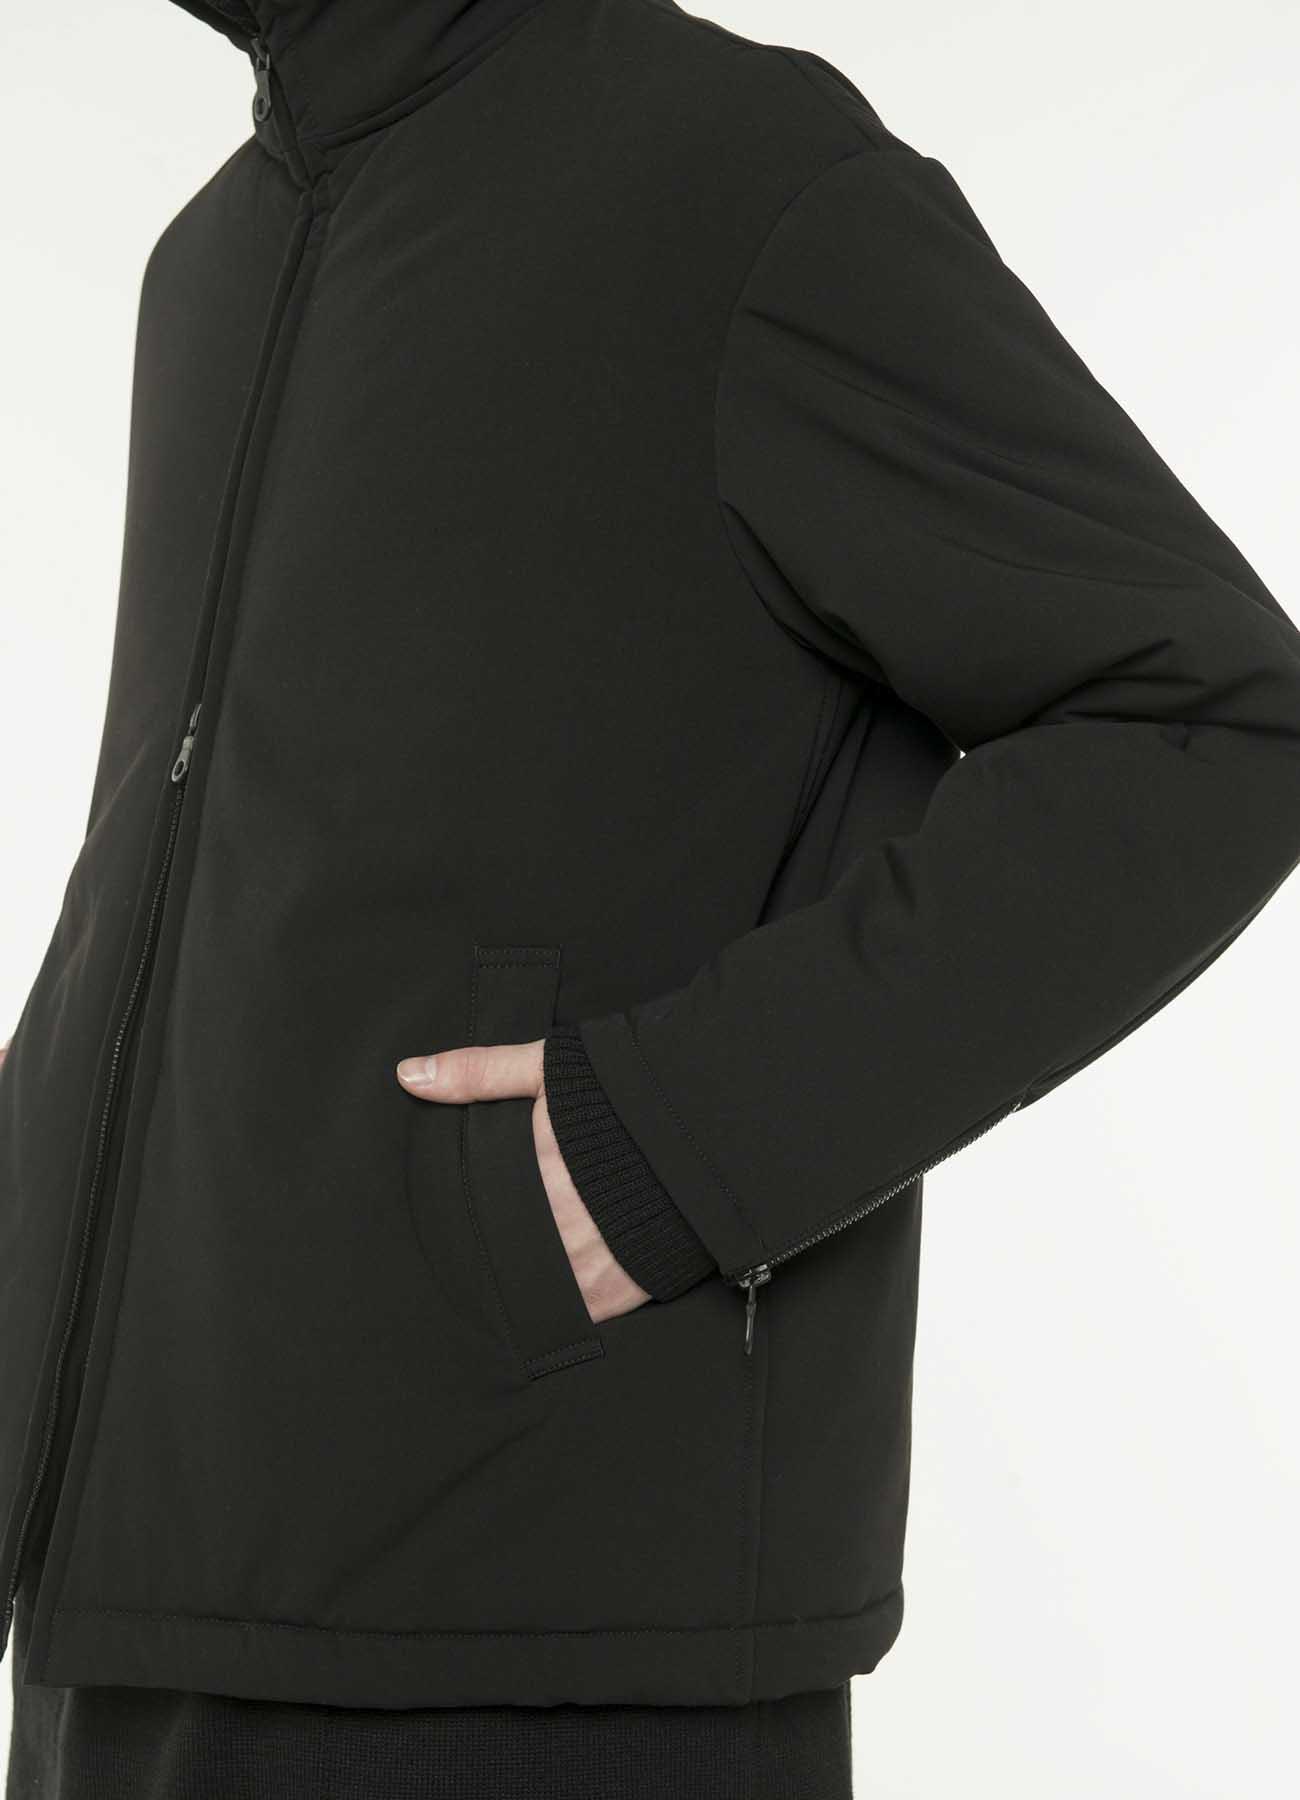 Pe / 人造丝轧别丁弹性面料拉链宽松夹克